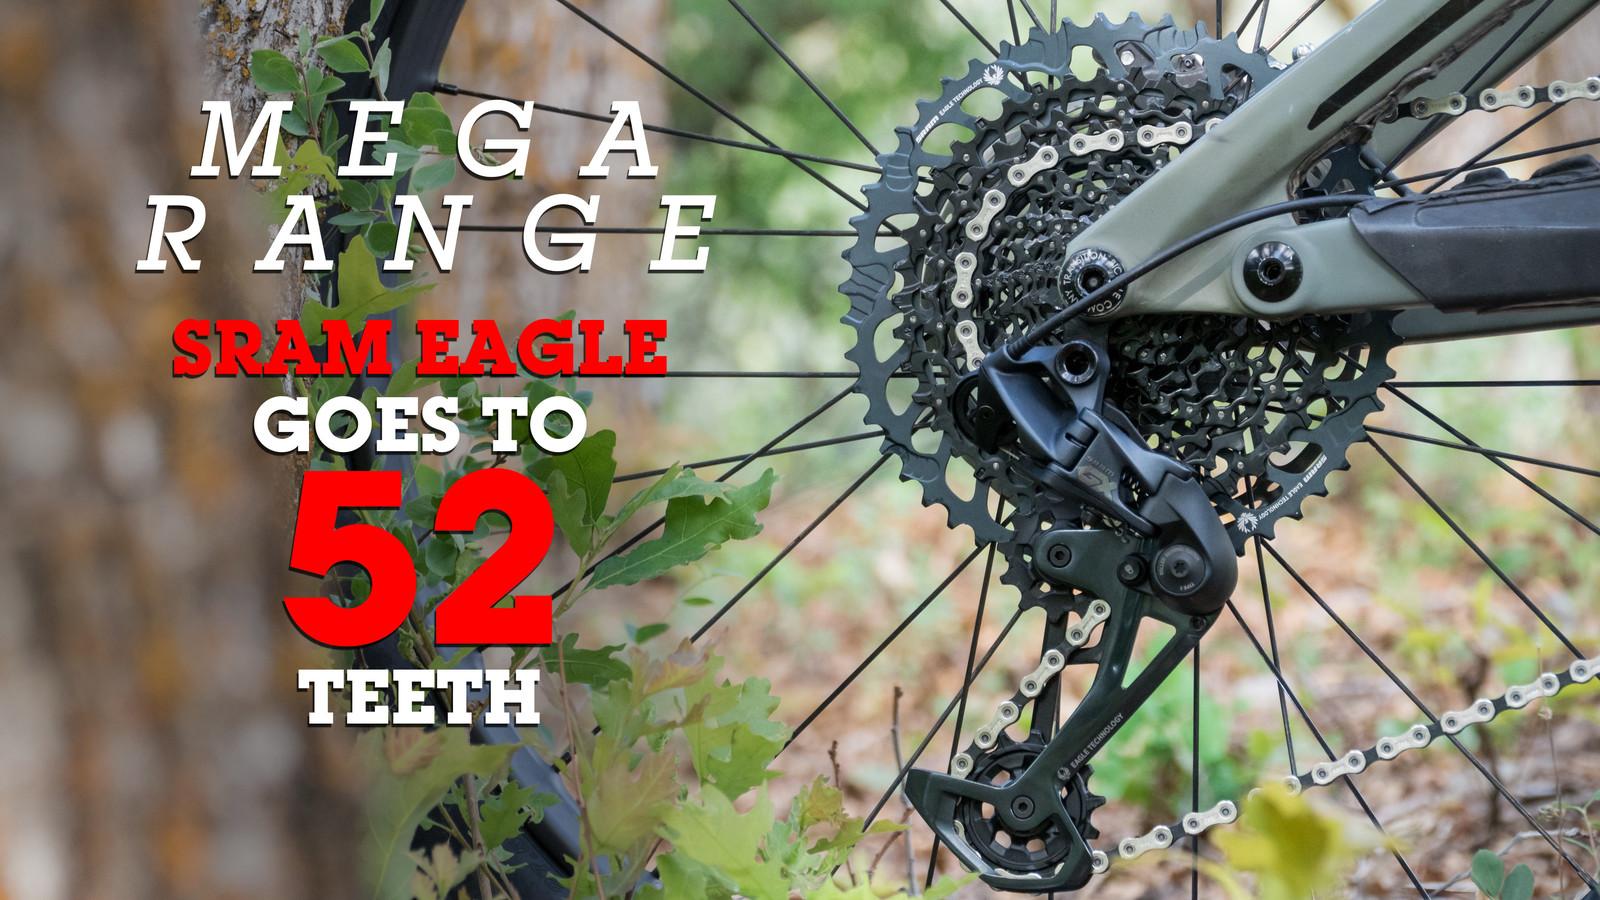 MEGA Range: SRAM Eagle Goes to 52 Teeth